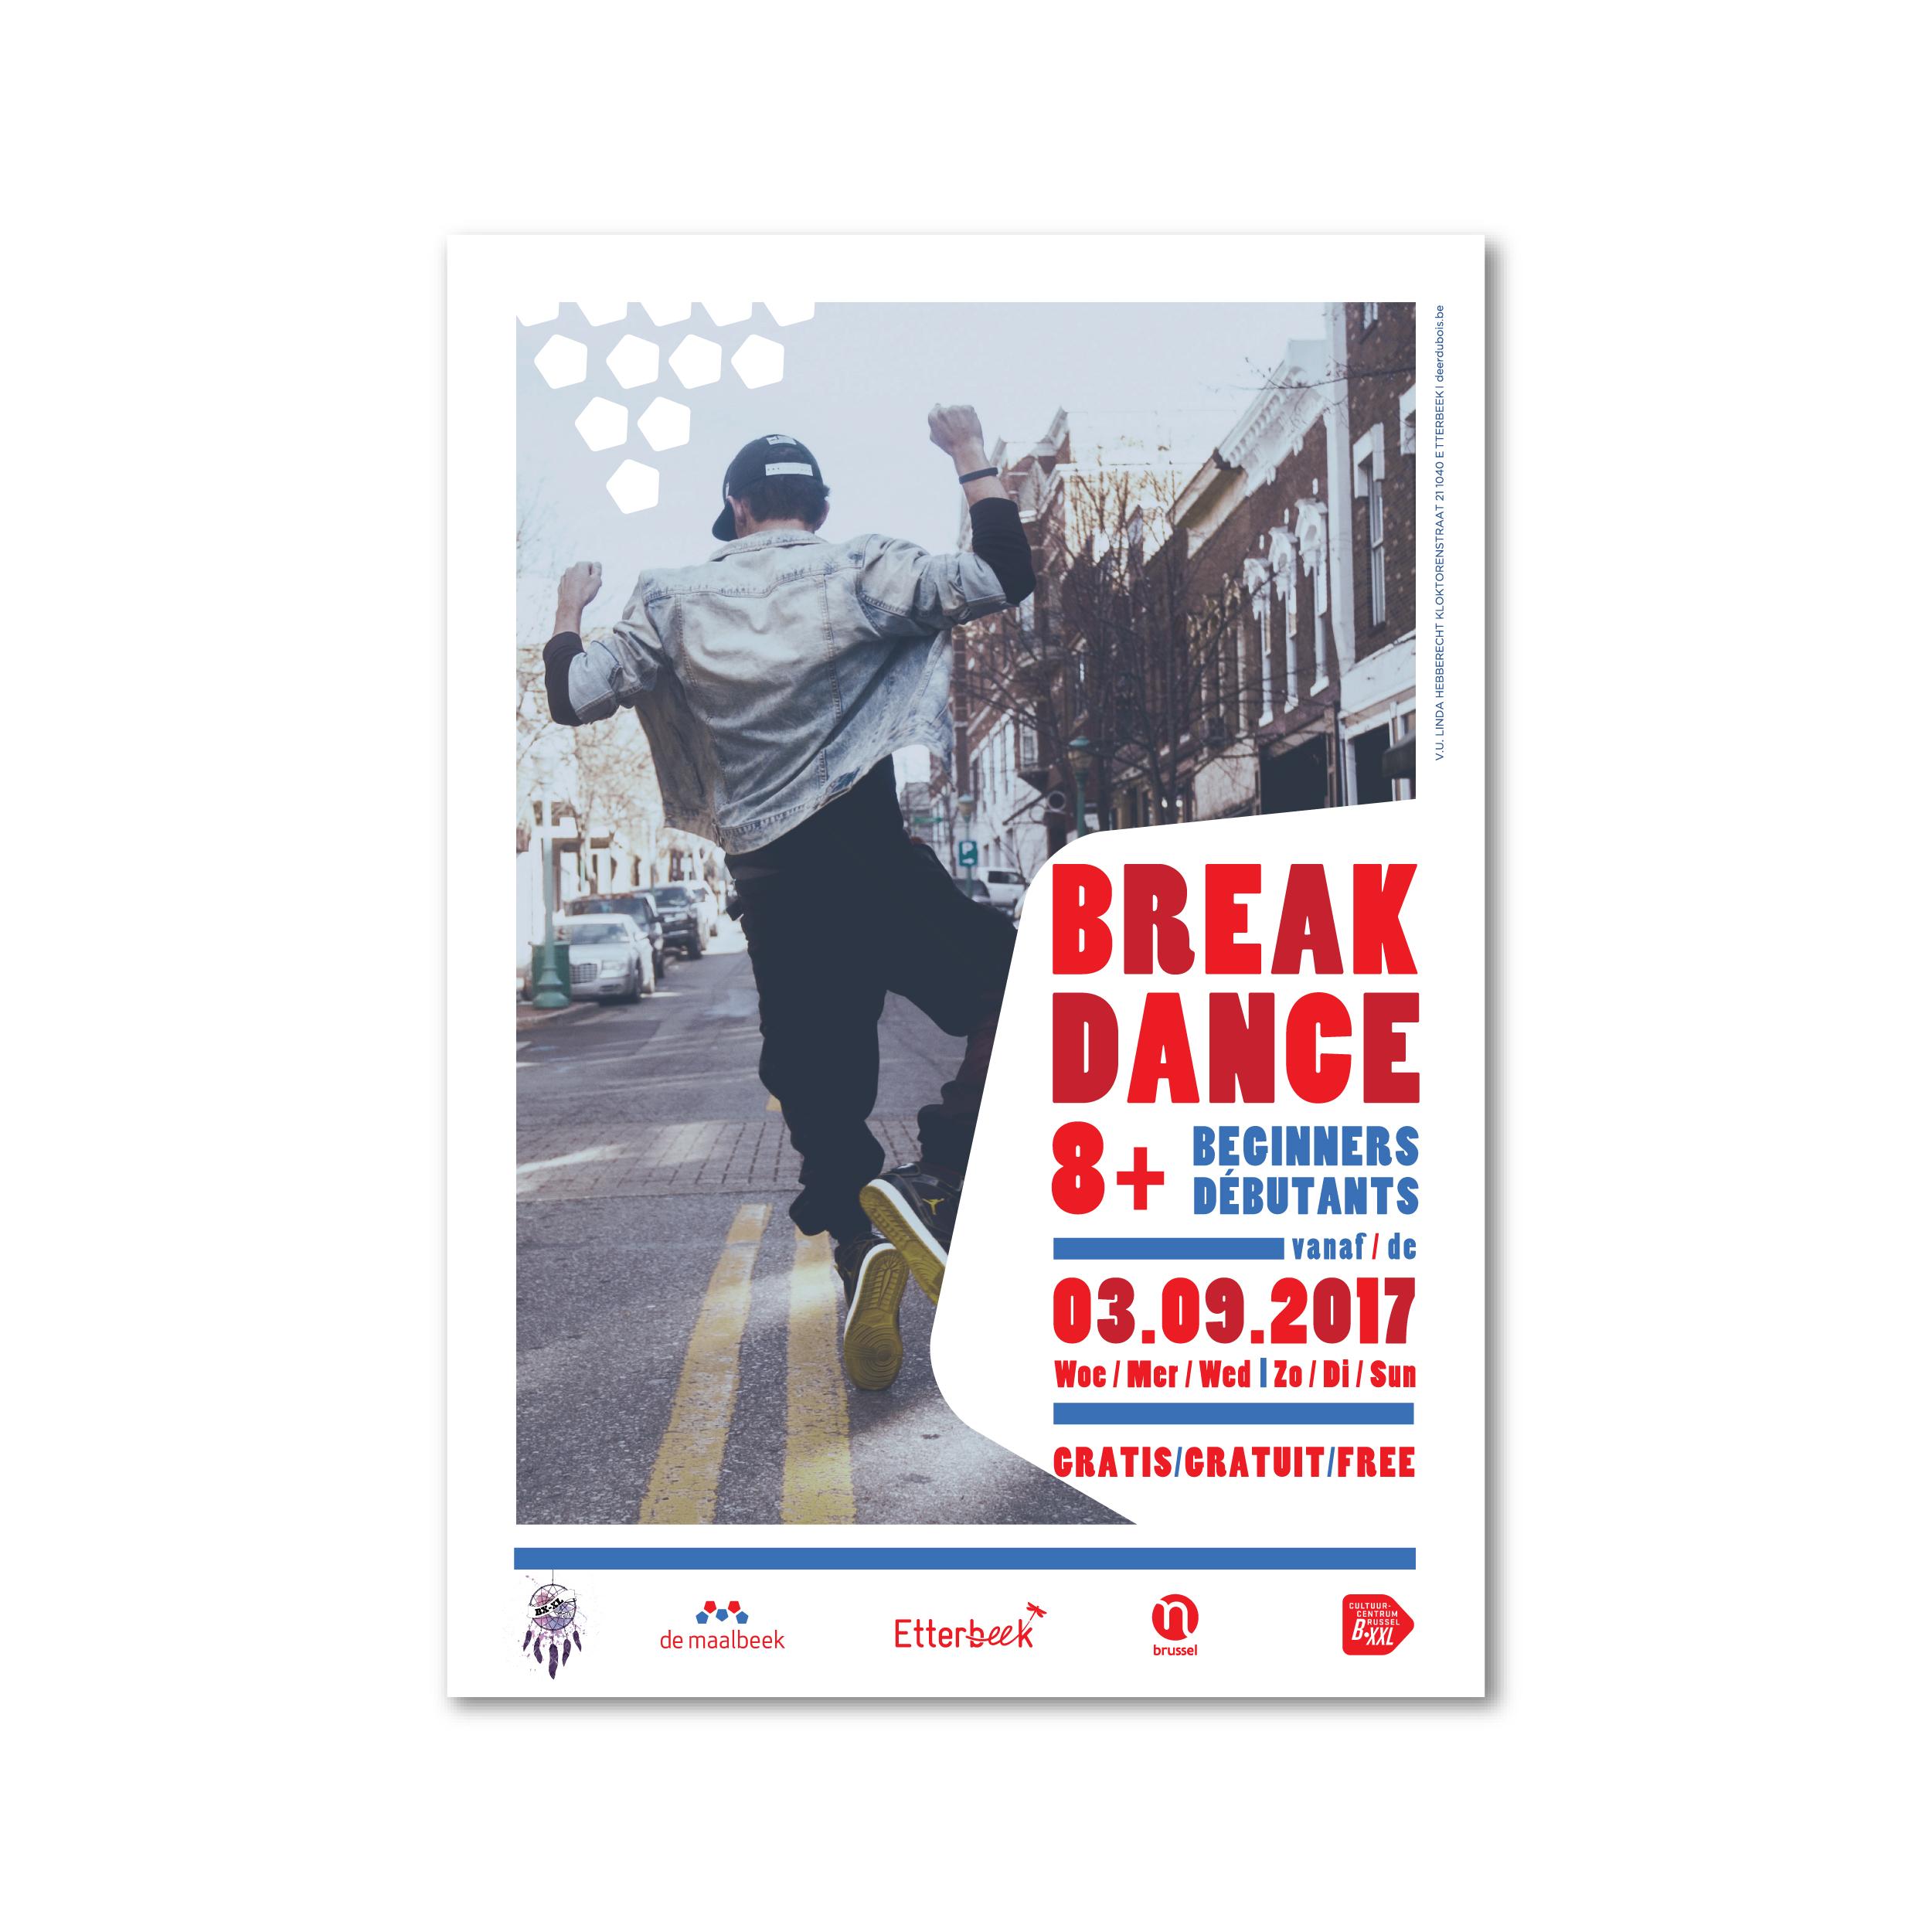 breakdance thumb19-01